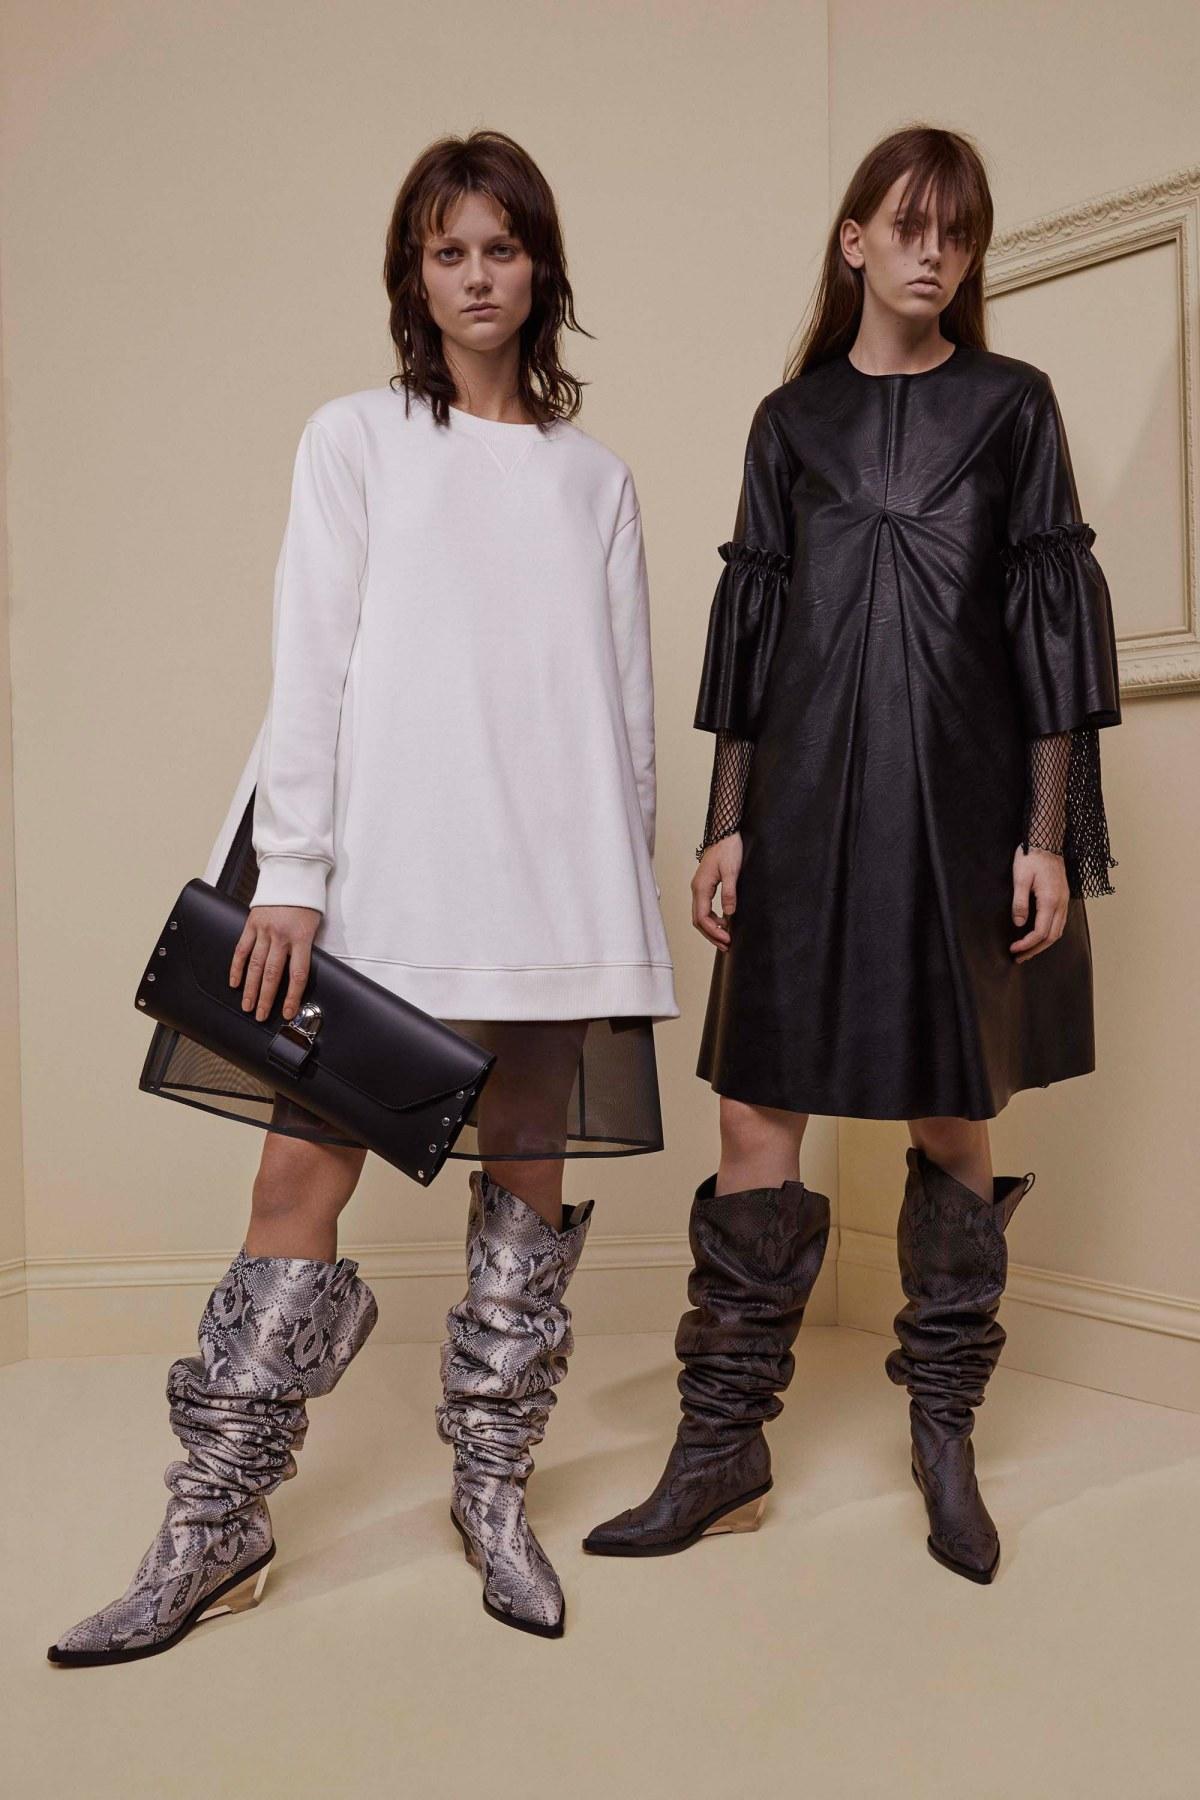 mm6-maison-margiela-pre-fall-2017-fashion-show-the-impression-18